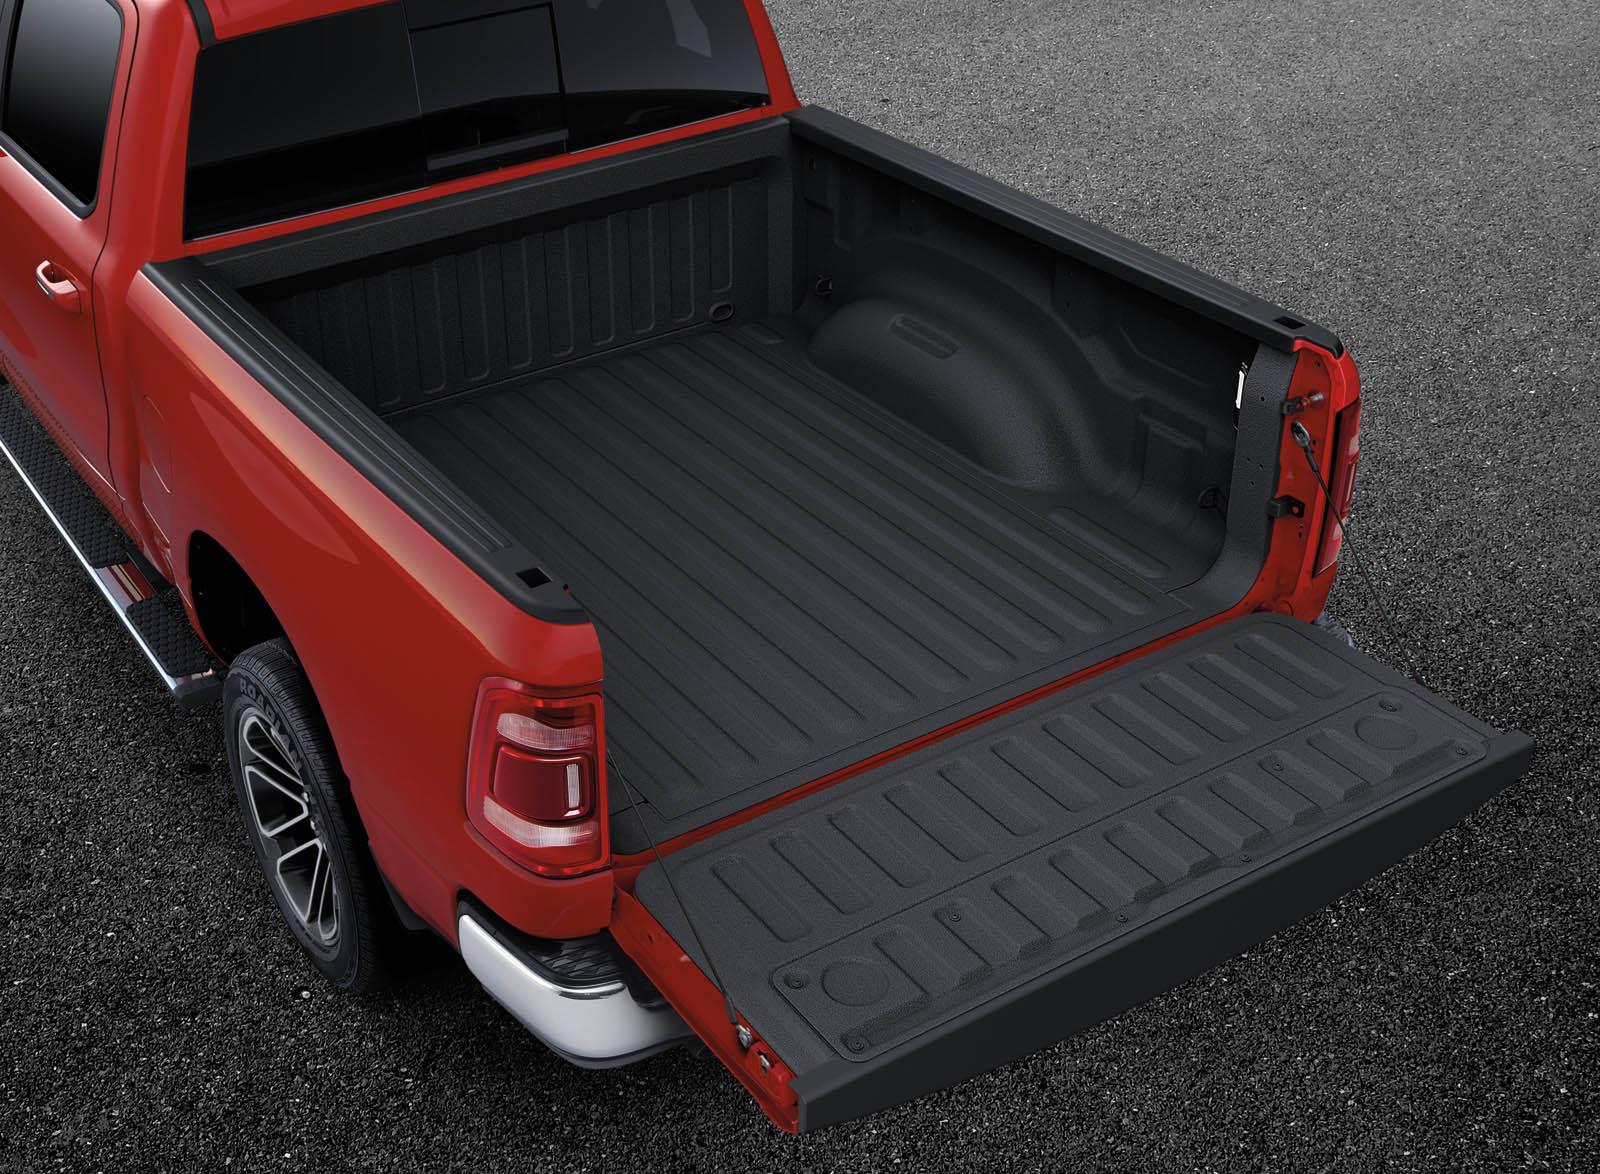 Tonneau Cover Dodge Ram 1500 >> 2019 Ram 1500 Looks Boss All Mopar'd Out In Patriot Blue ...